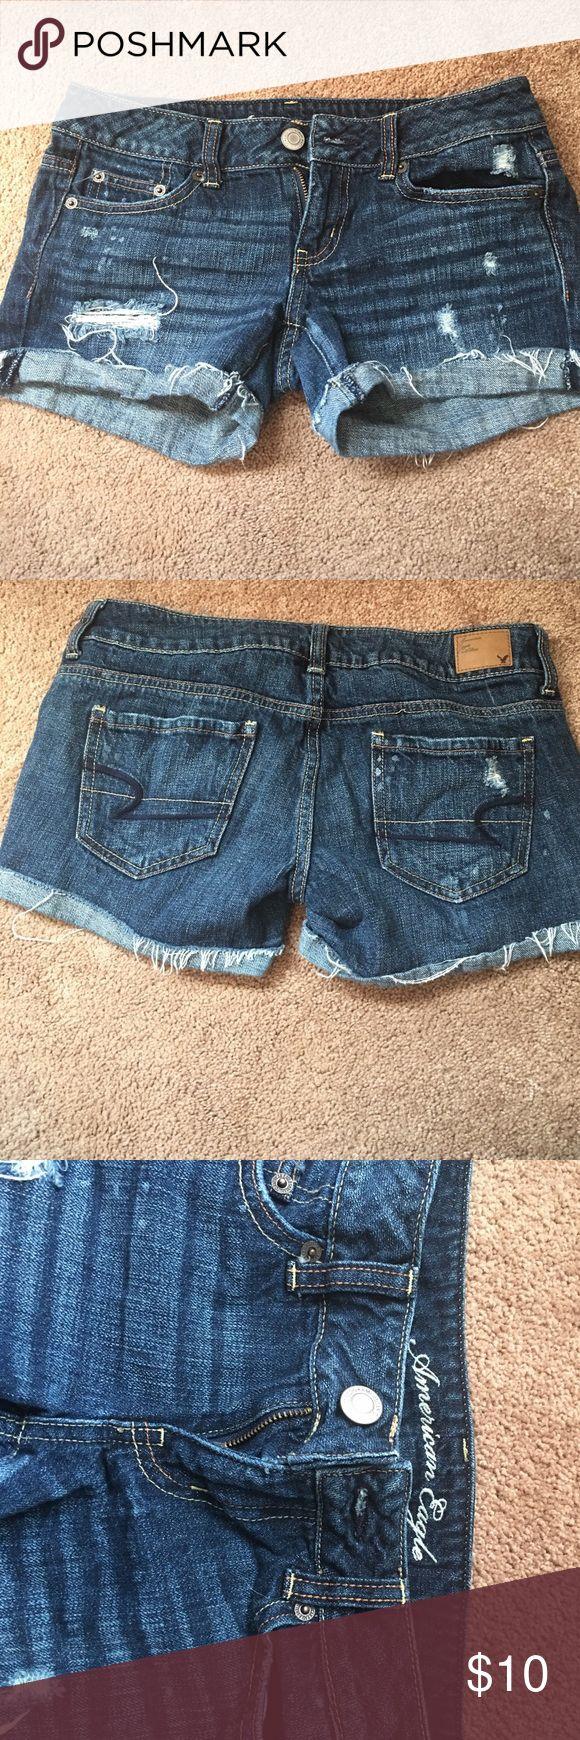 American Eagle denim shorts American Eagle denim shorts. Only worn a few times and in good condition! American Eagle Outfitters Shorts Jean Shorts